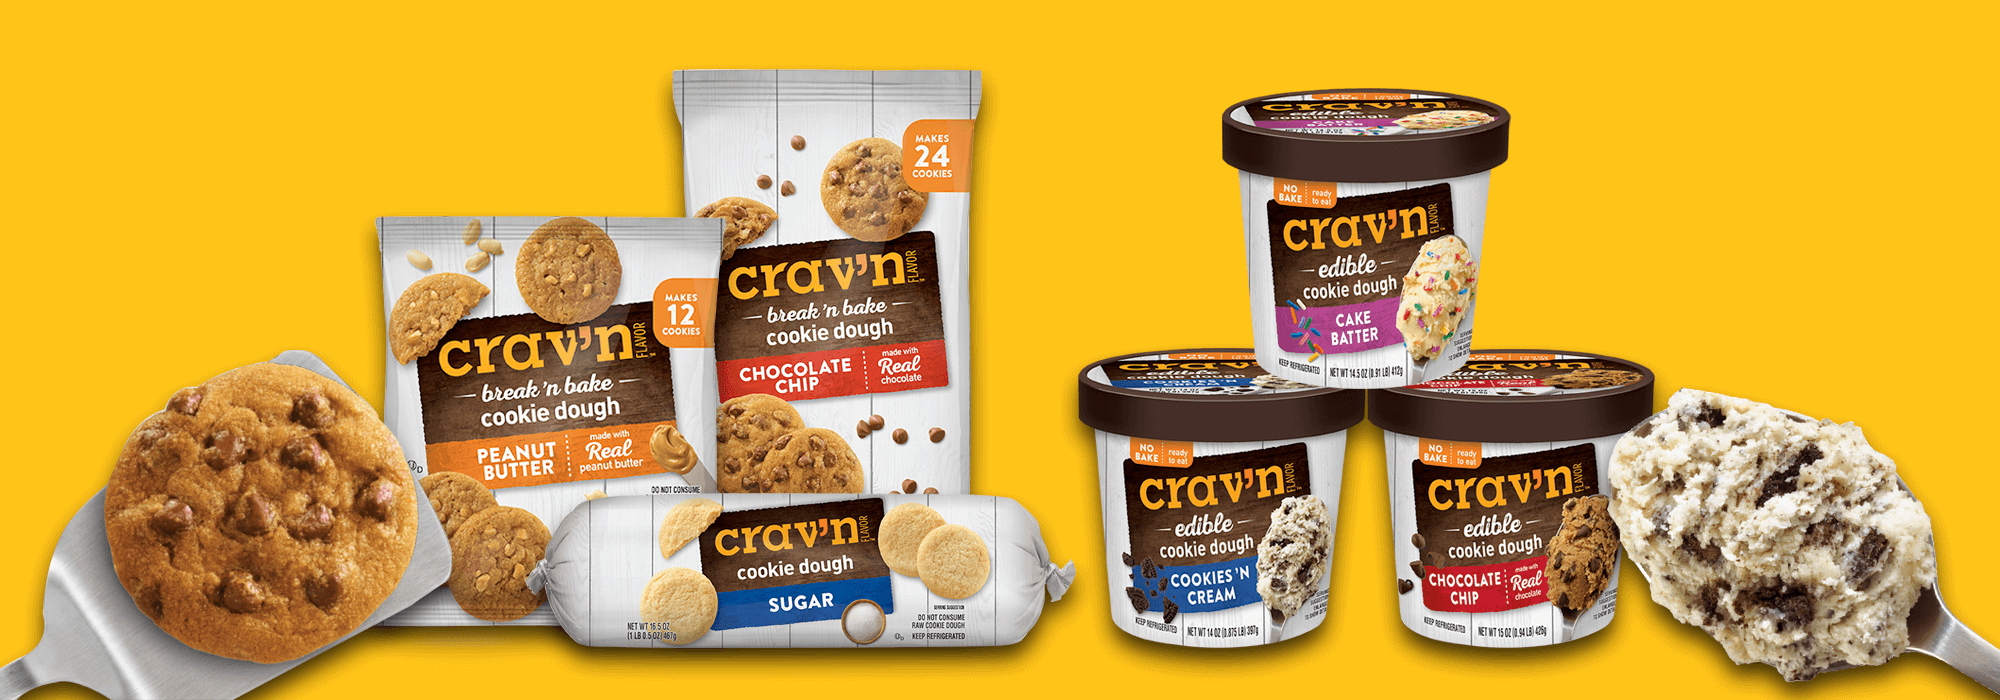 Cookie dough and ice cream